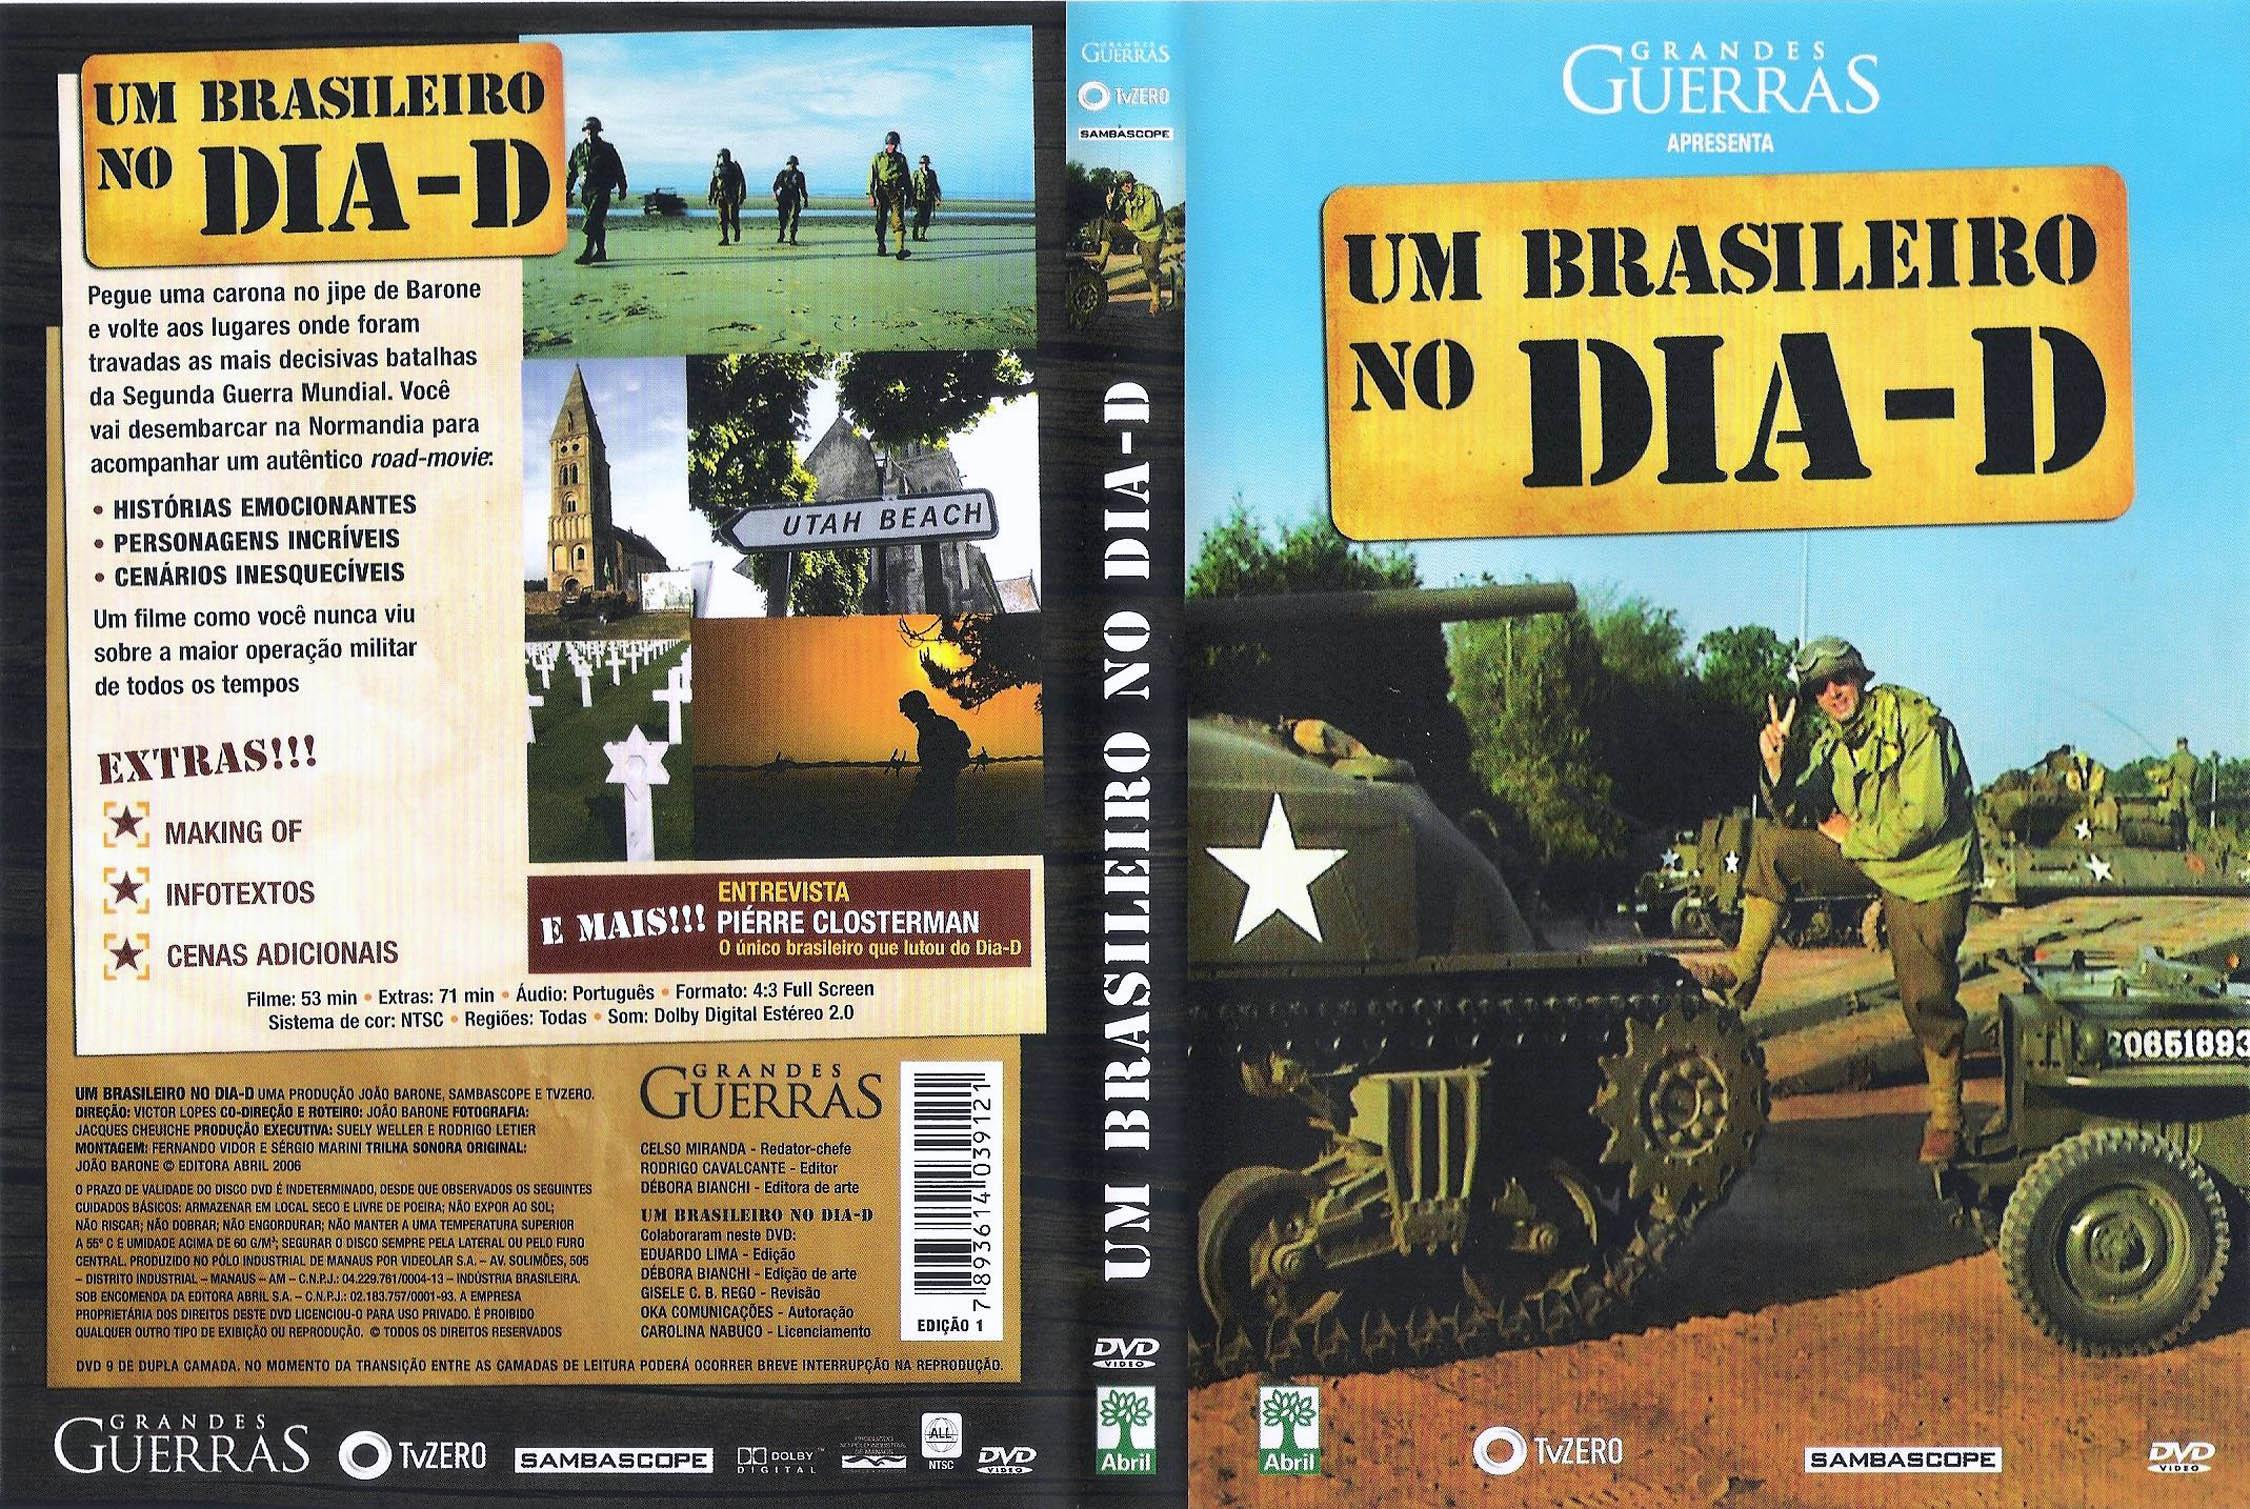 UmBrasileiroNoDiaD